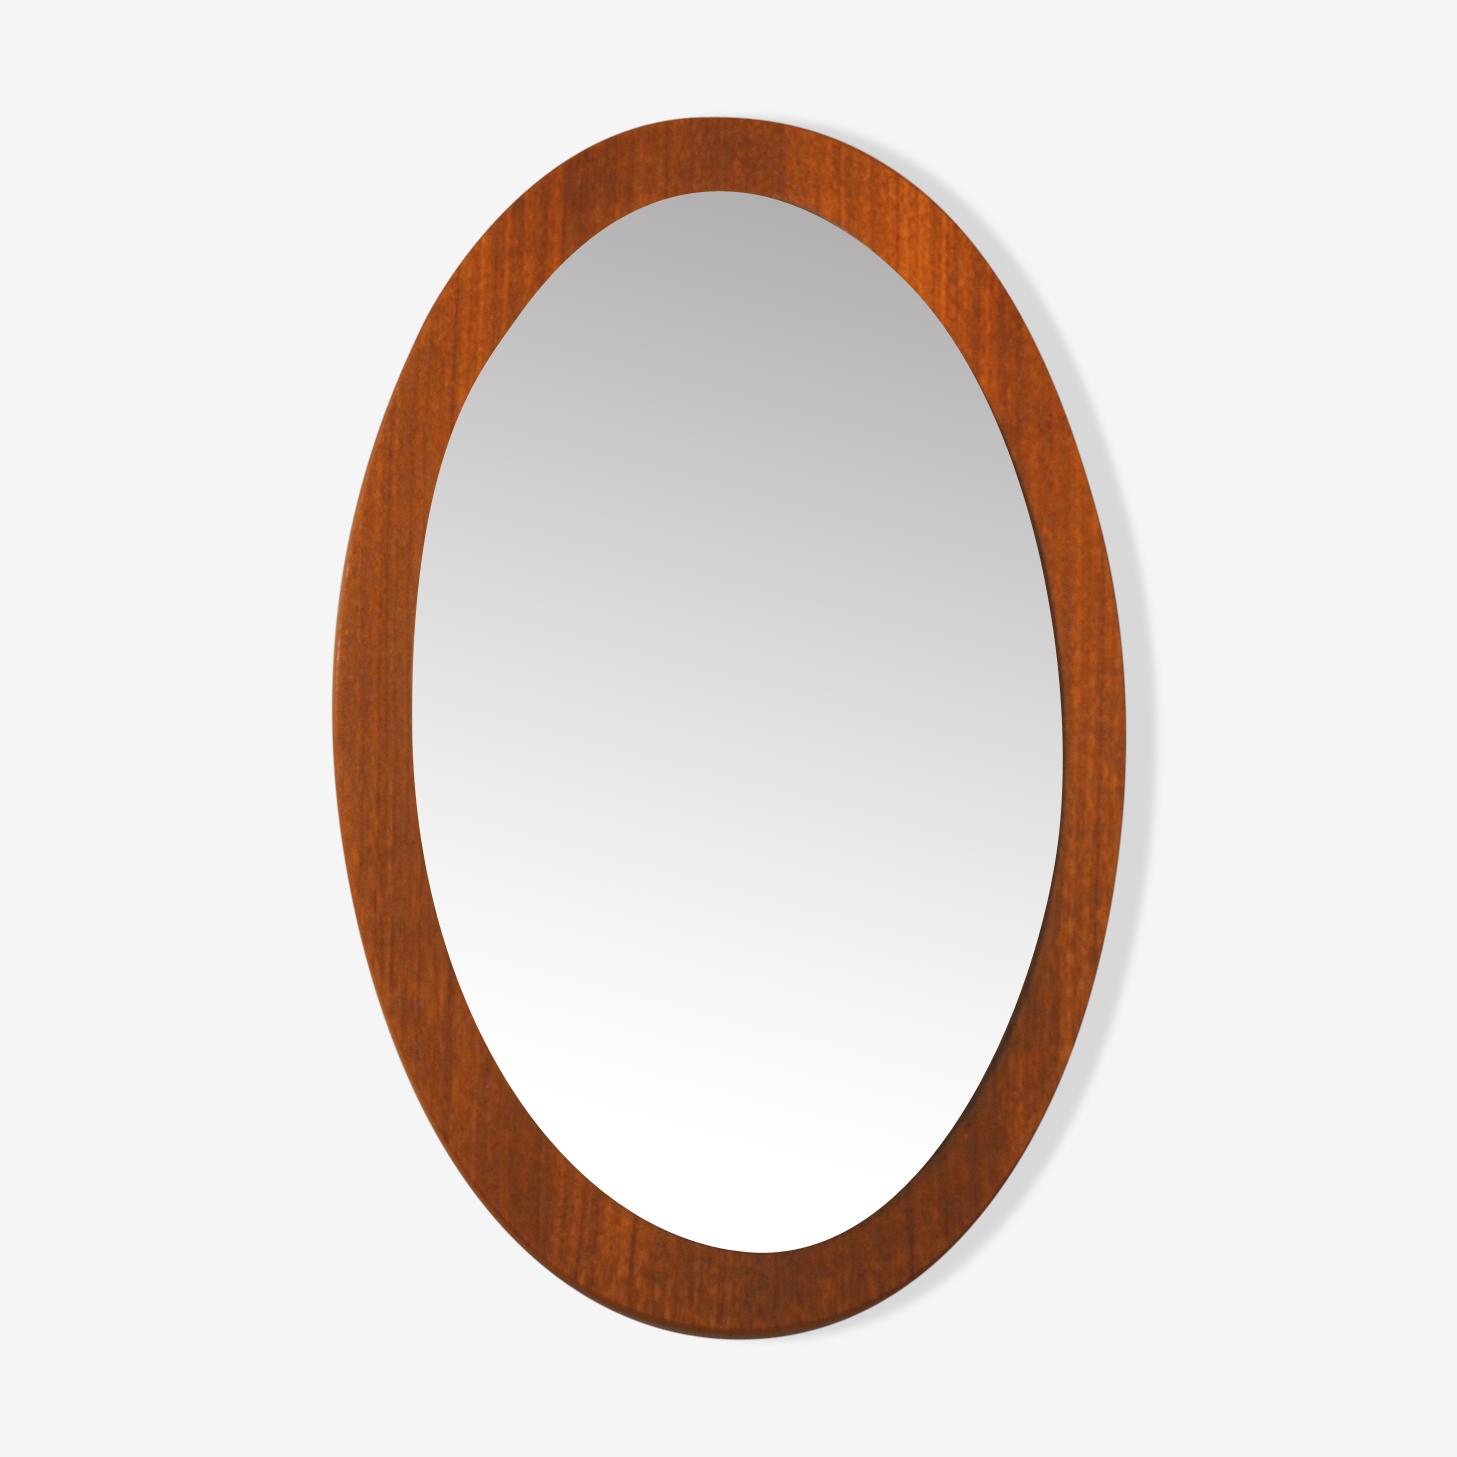 Scandinavian teak 60s oval mirror 57 x 37 cm